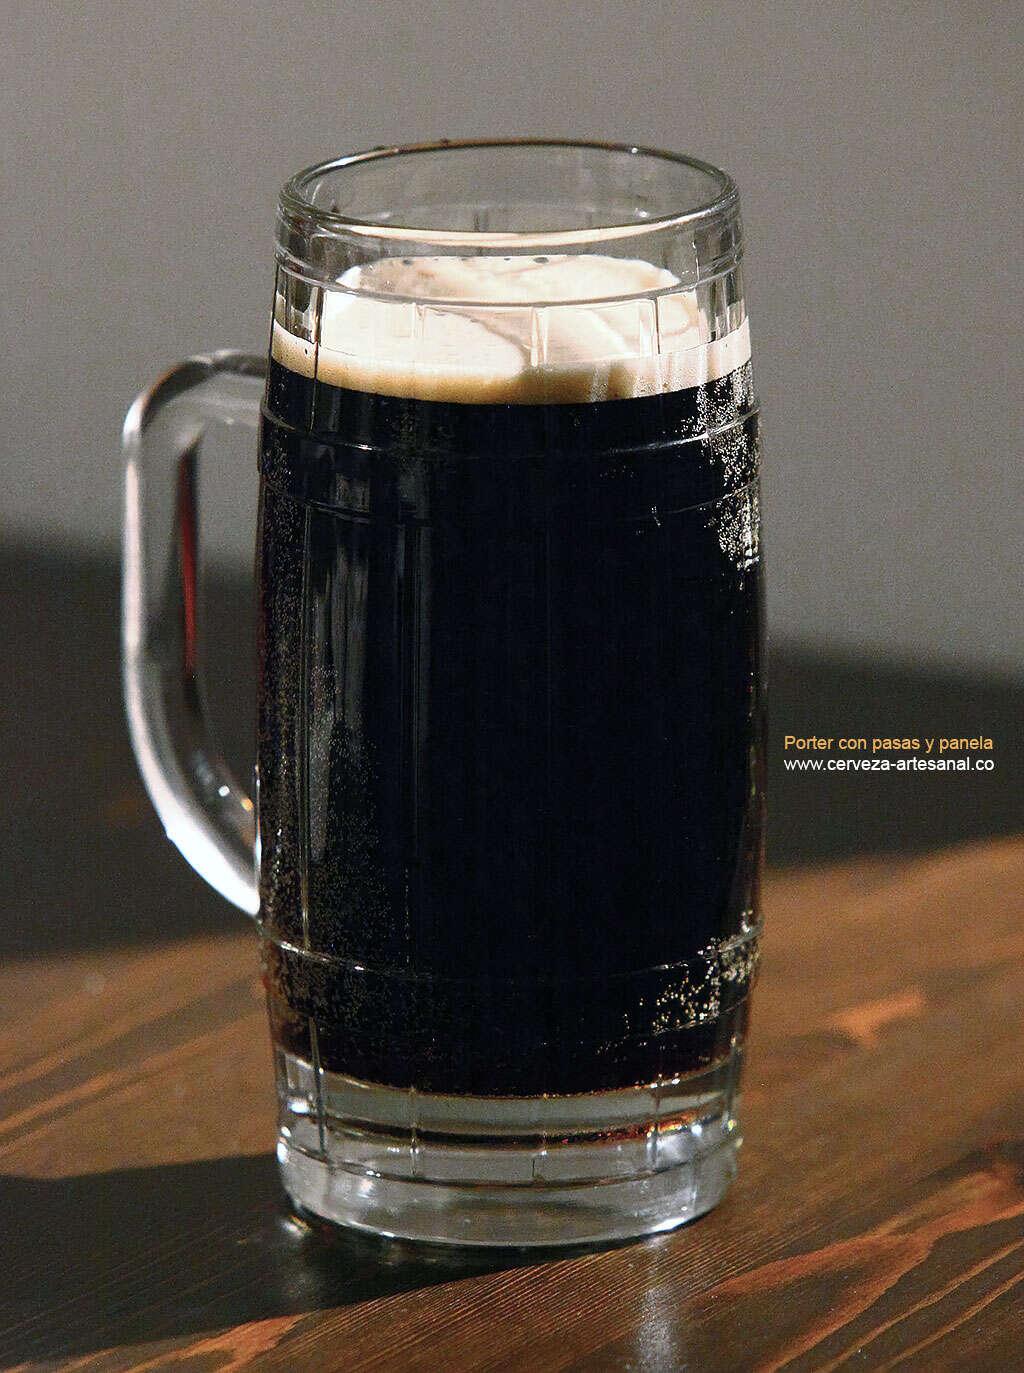 Cerveza porter con panela, carbonatada con pasas de arándanos